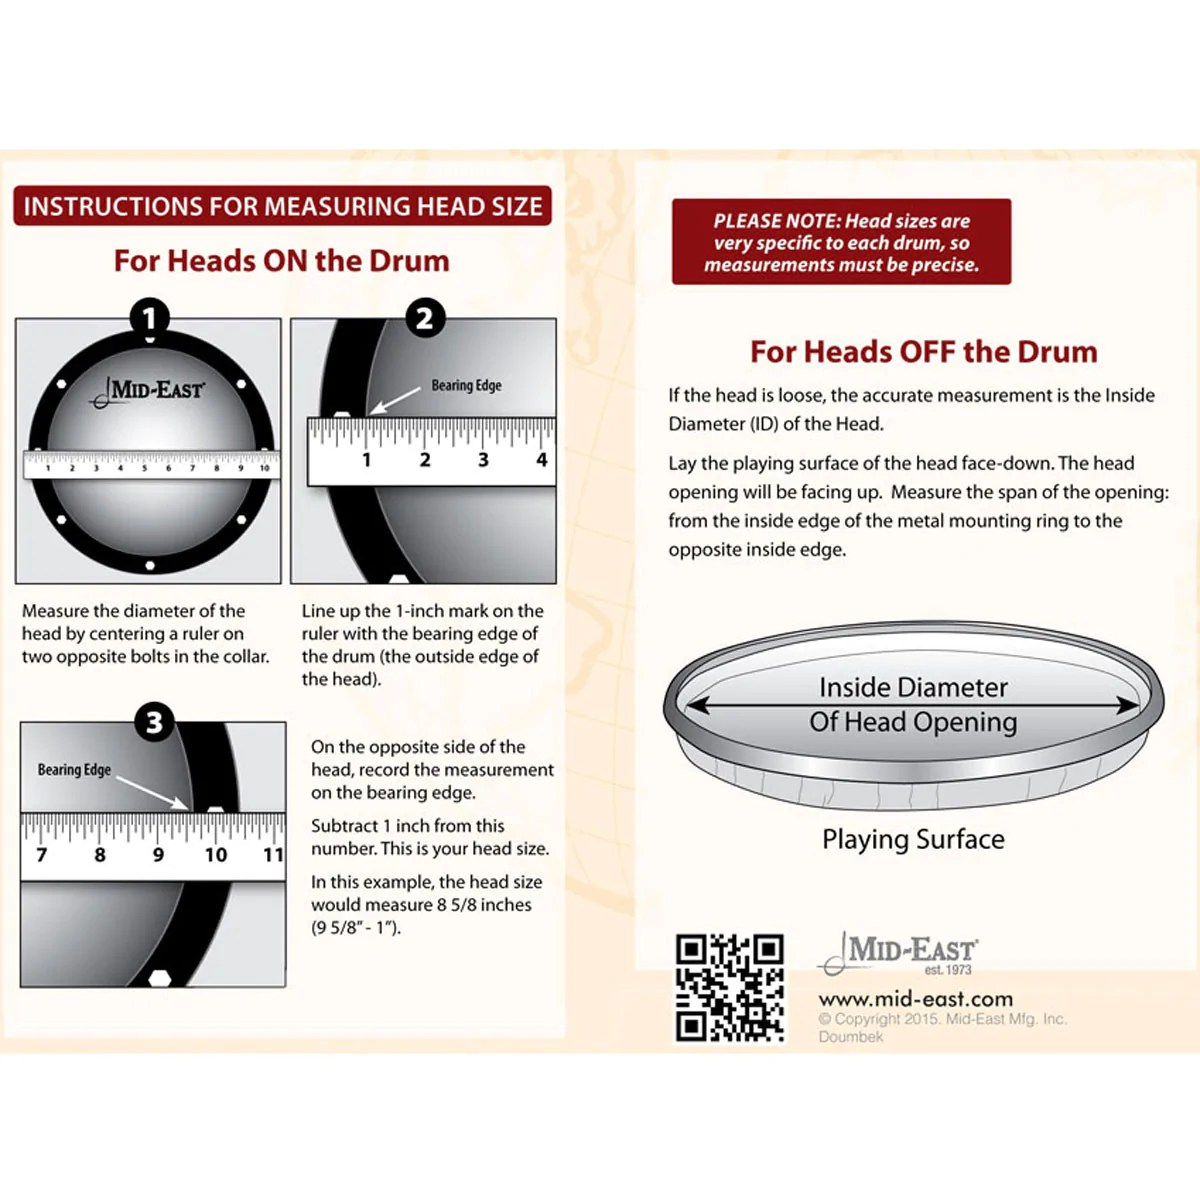 remo shoulder strap for externally tuned doumbek metal doumbek accessories hk 3200 dk instrumantra [ 1200 x 1200 Pixel ]